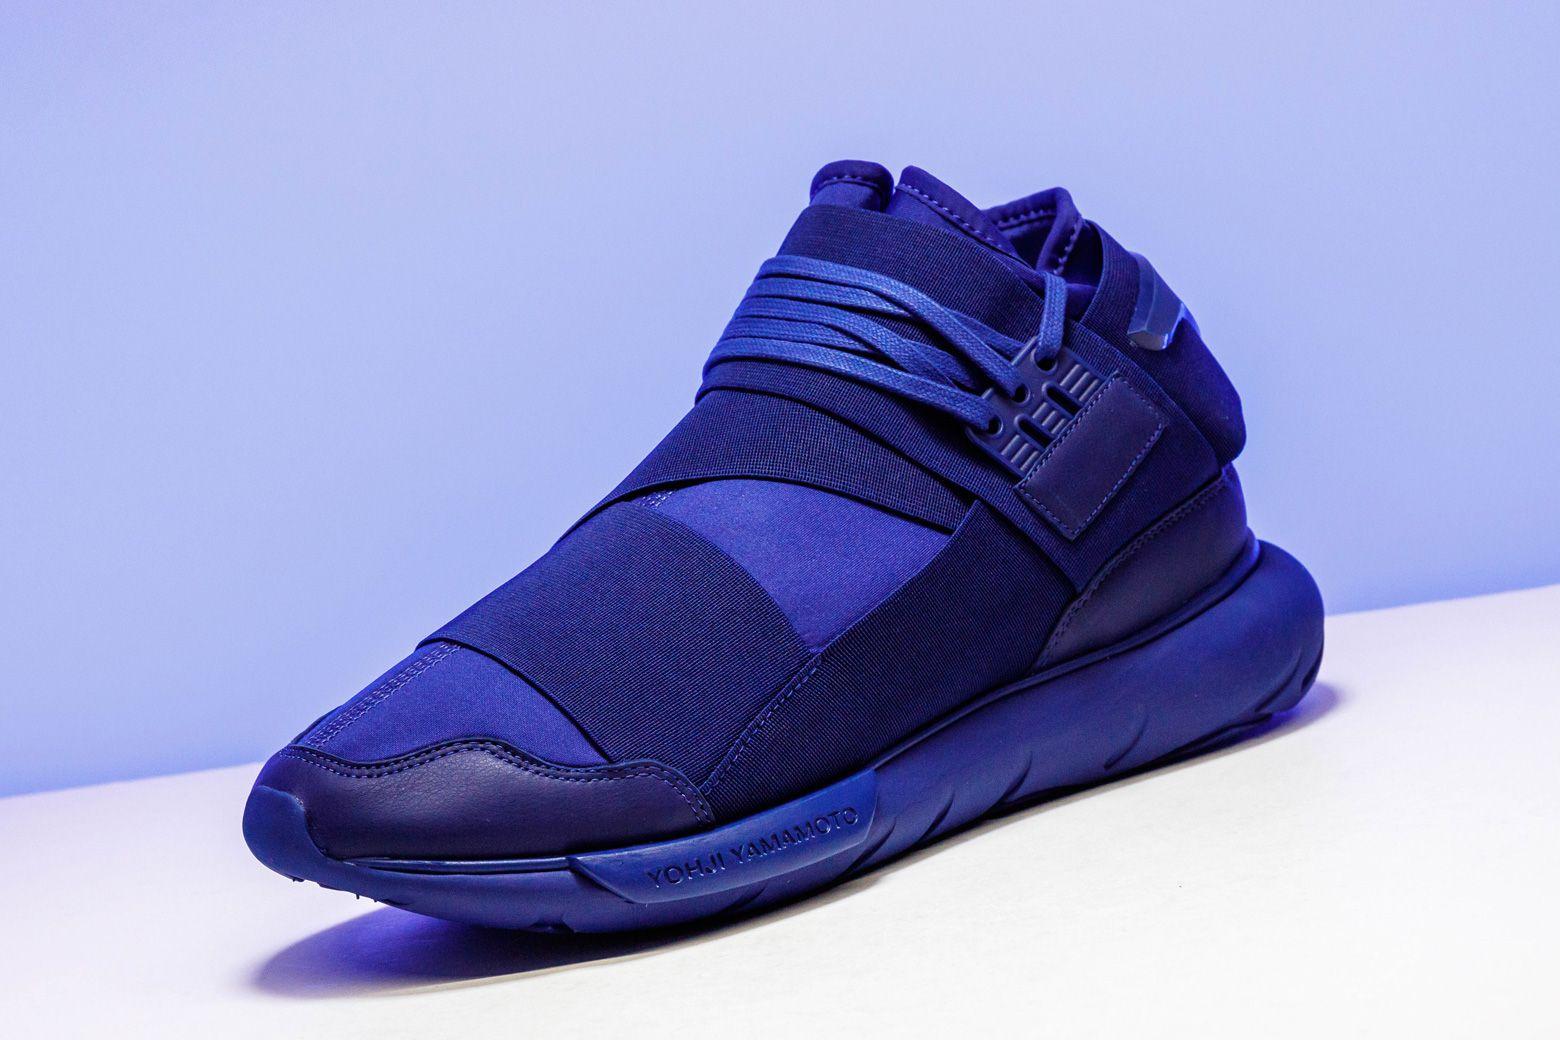 e760b25d7 Keep it tonal with this adidas Y-3 Qasa High in an eye-catching